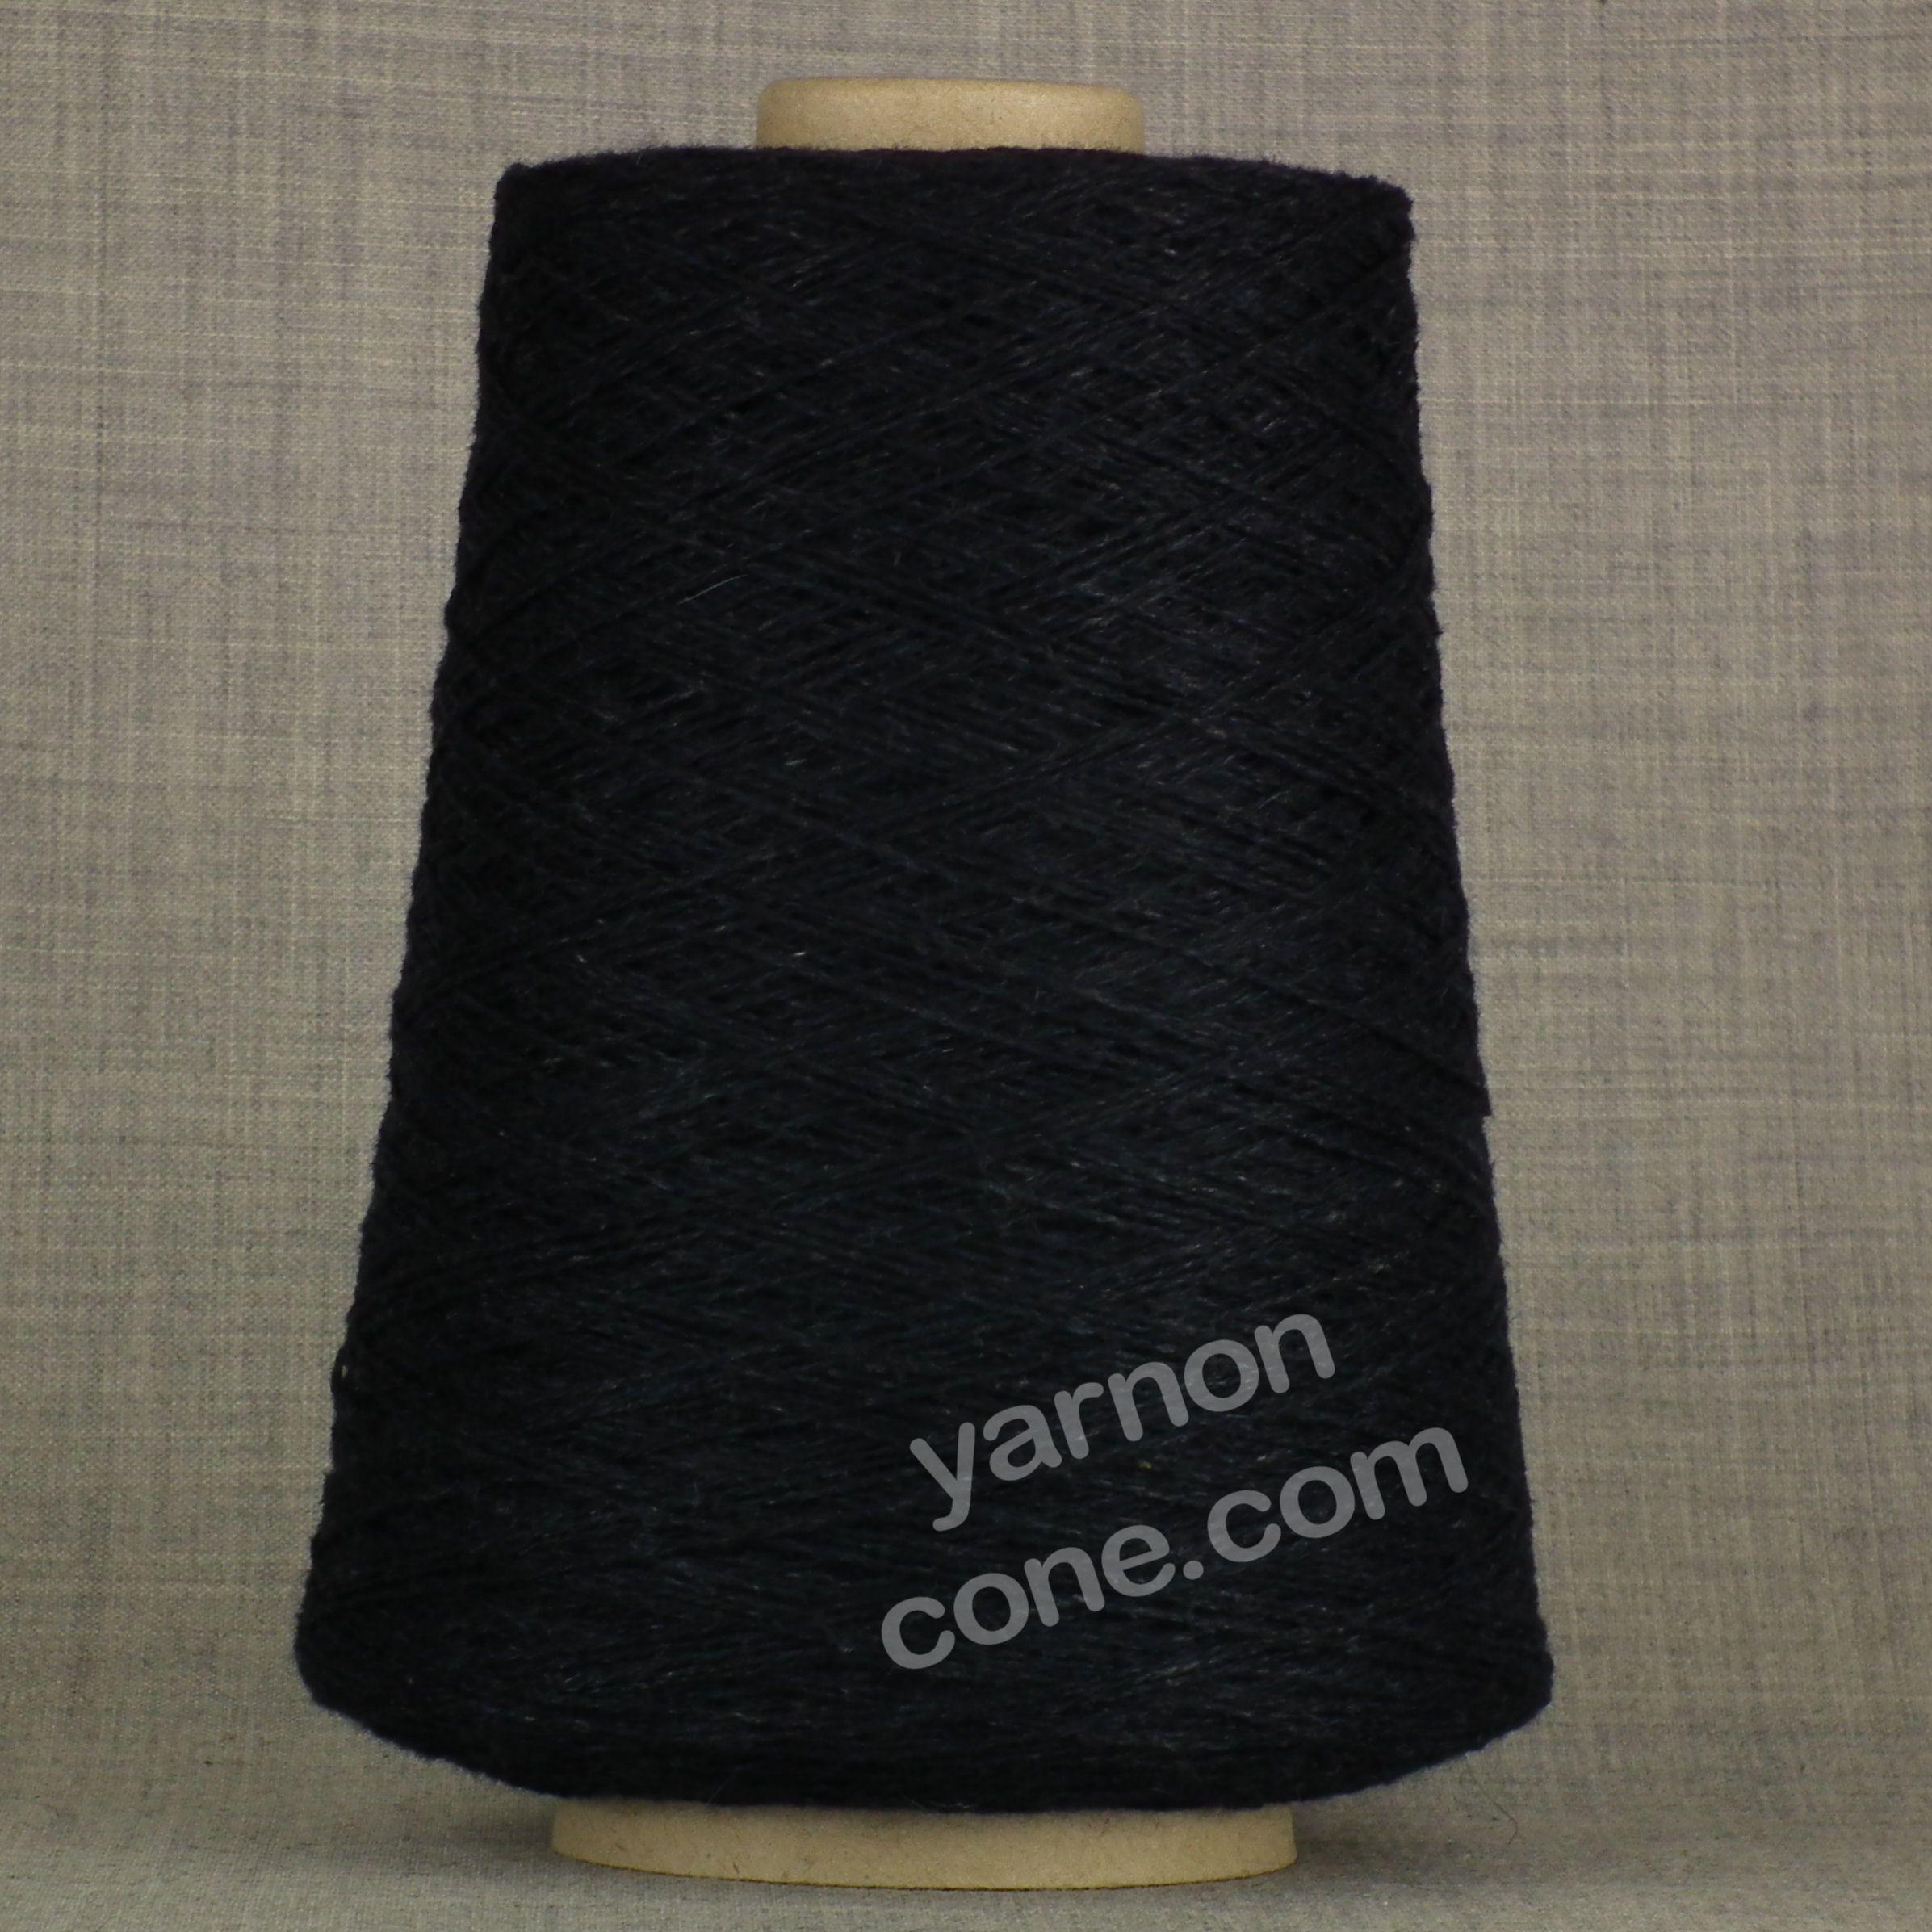 Navy blue dark melange cashmere merino 3 ply yarn on cone wool hand machine knit